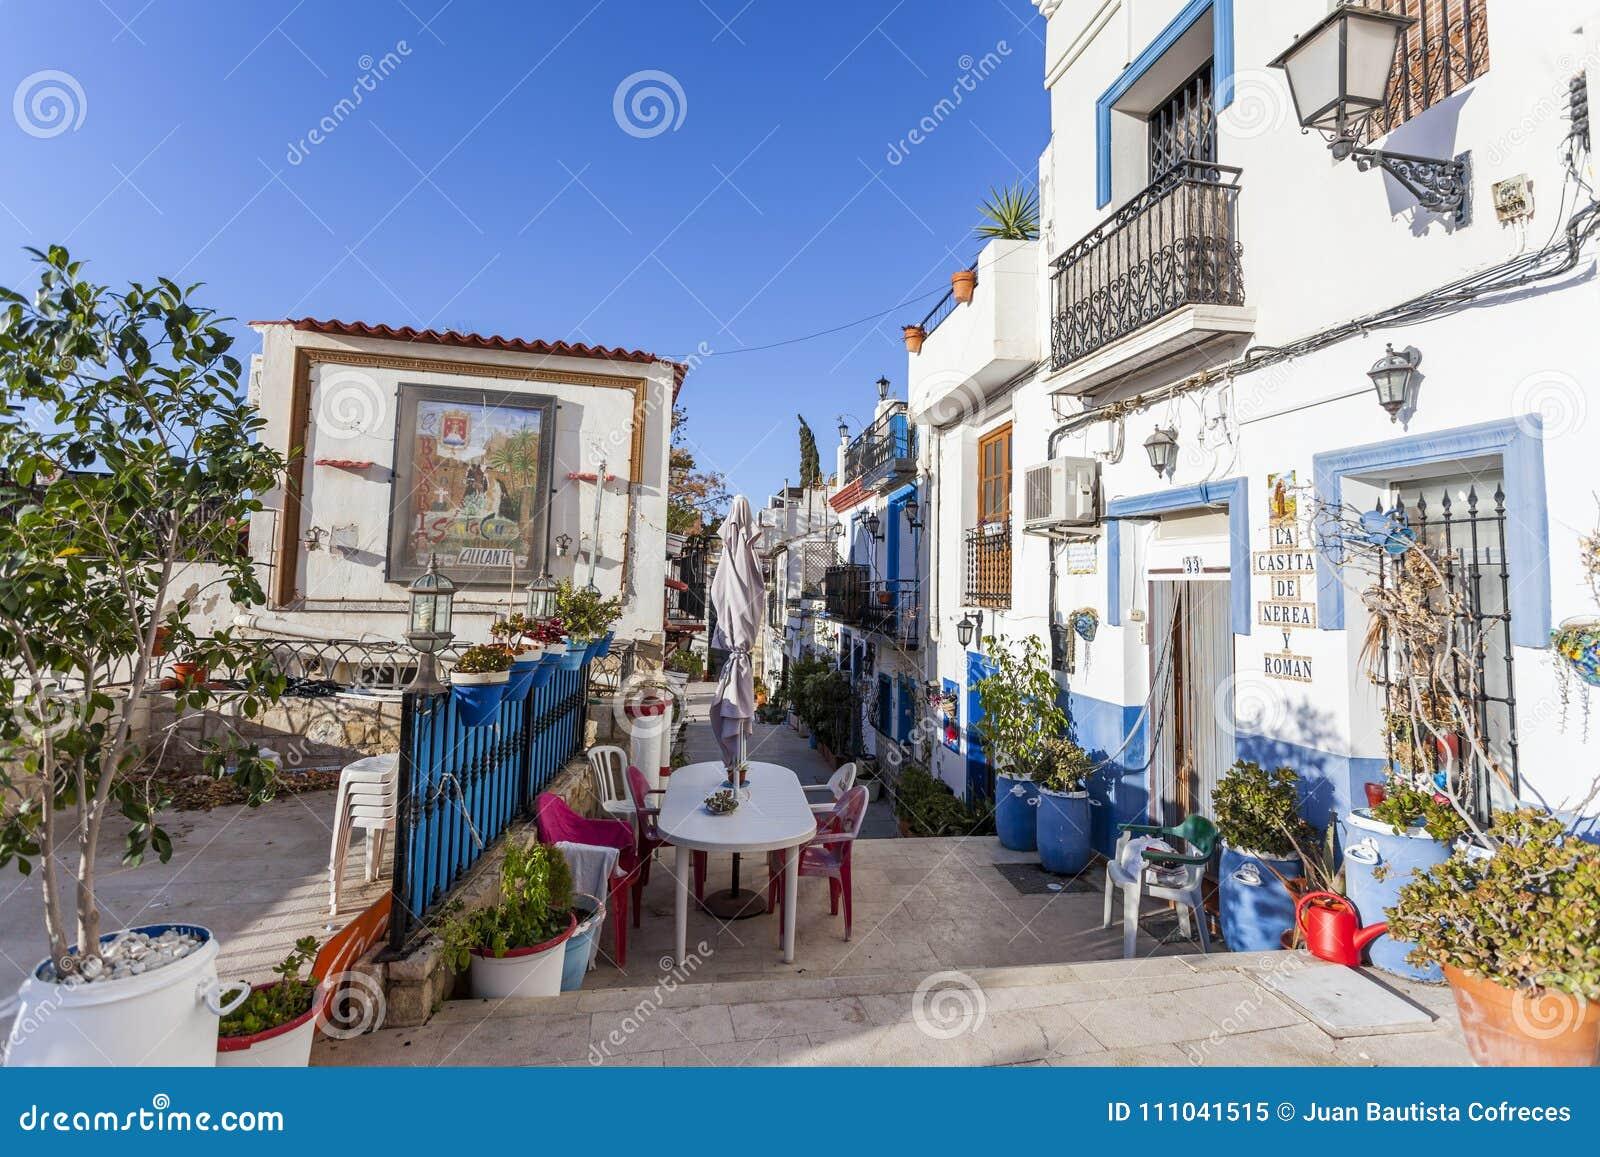 colored picturesque houses streettypical neighborhood historic center casco antiguobarrio santa cruzalicante spain